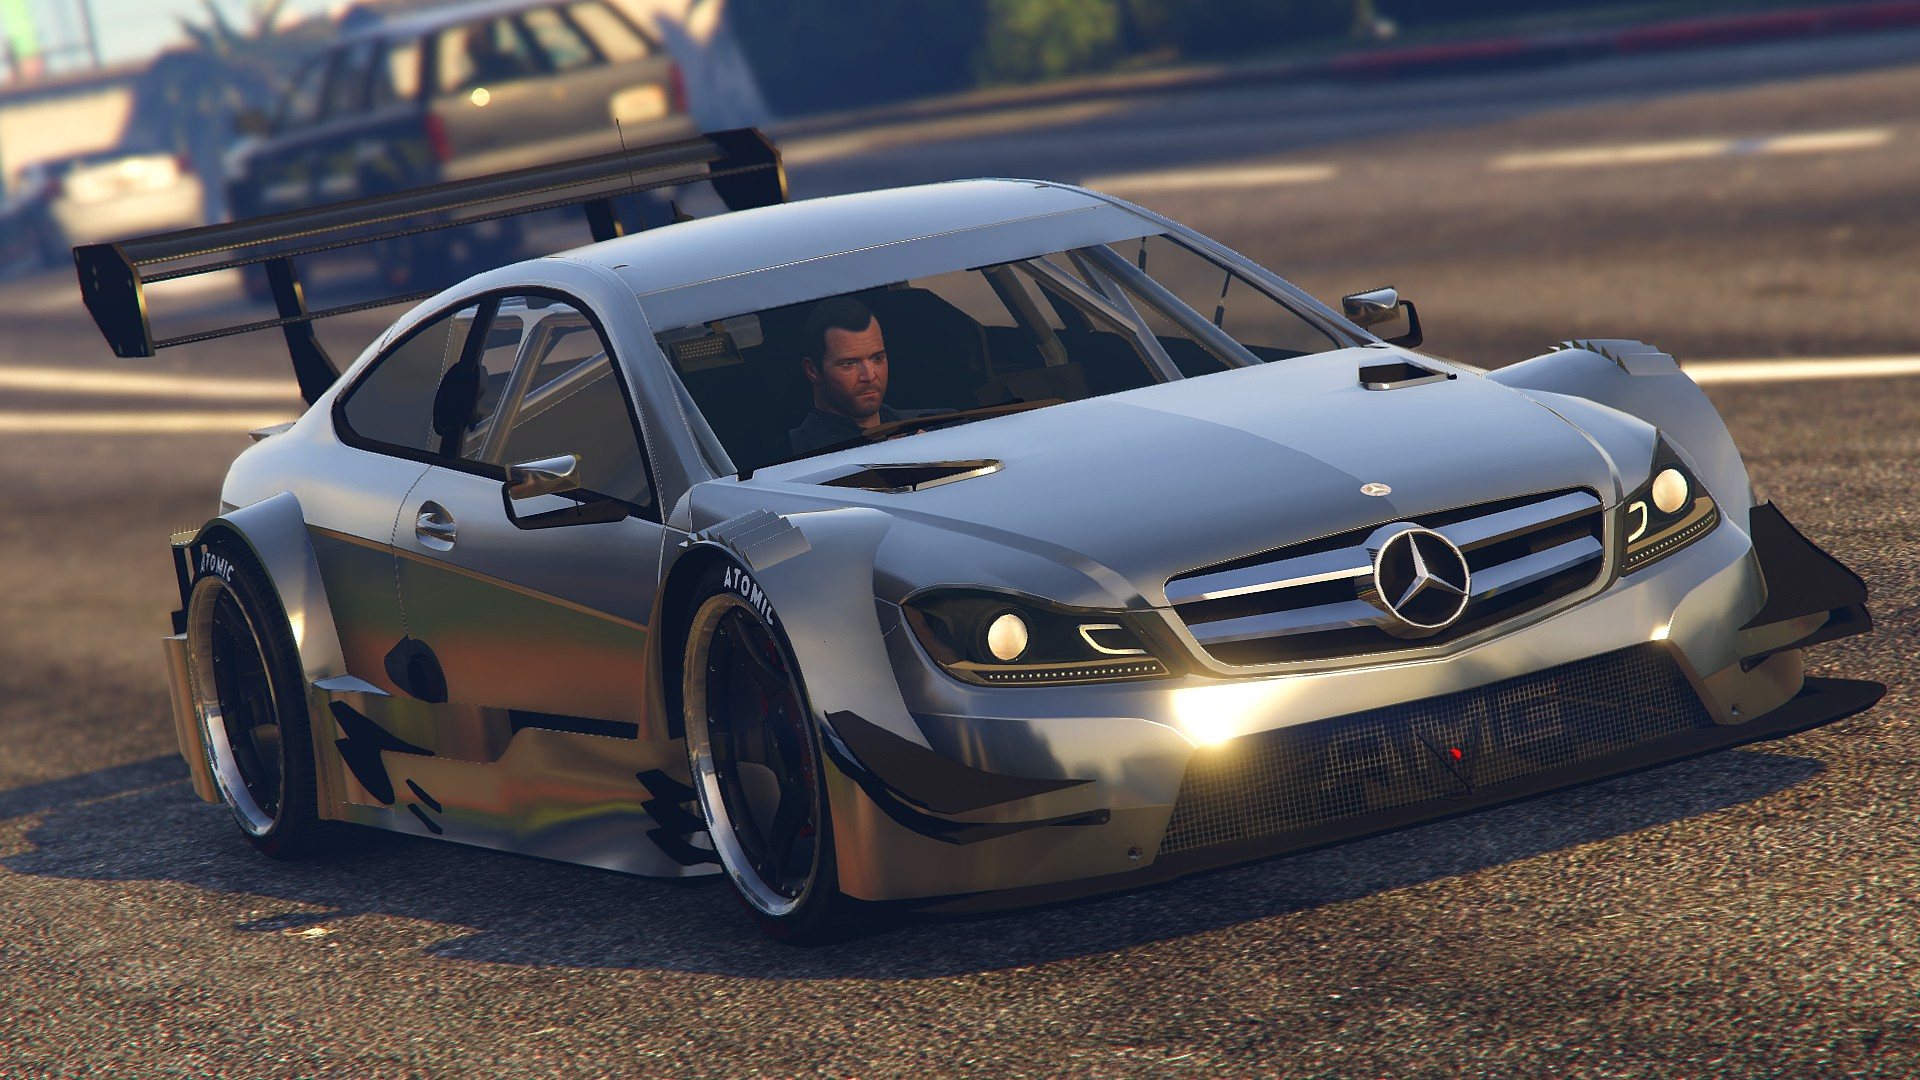 2013 Mercedes Benz Amg Dtm C204 Gta5 Mods Com